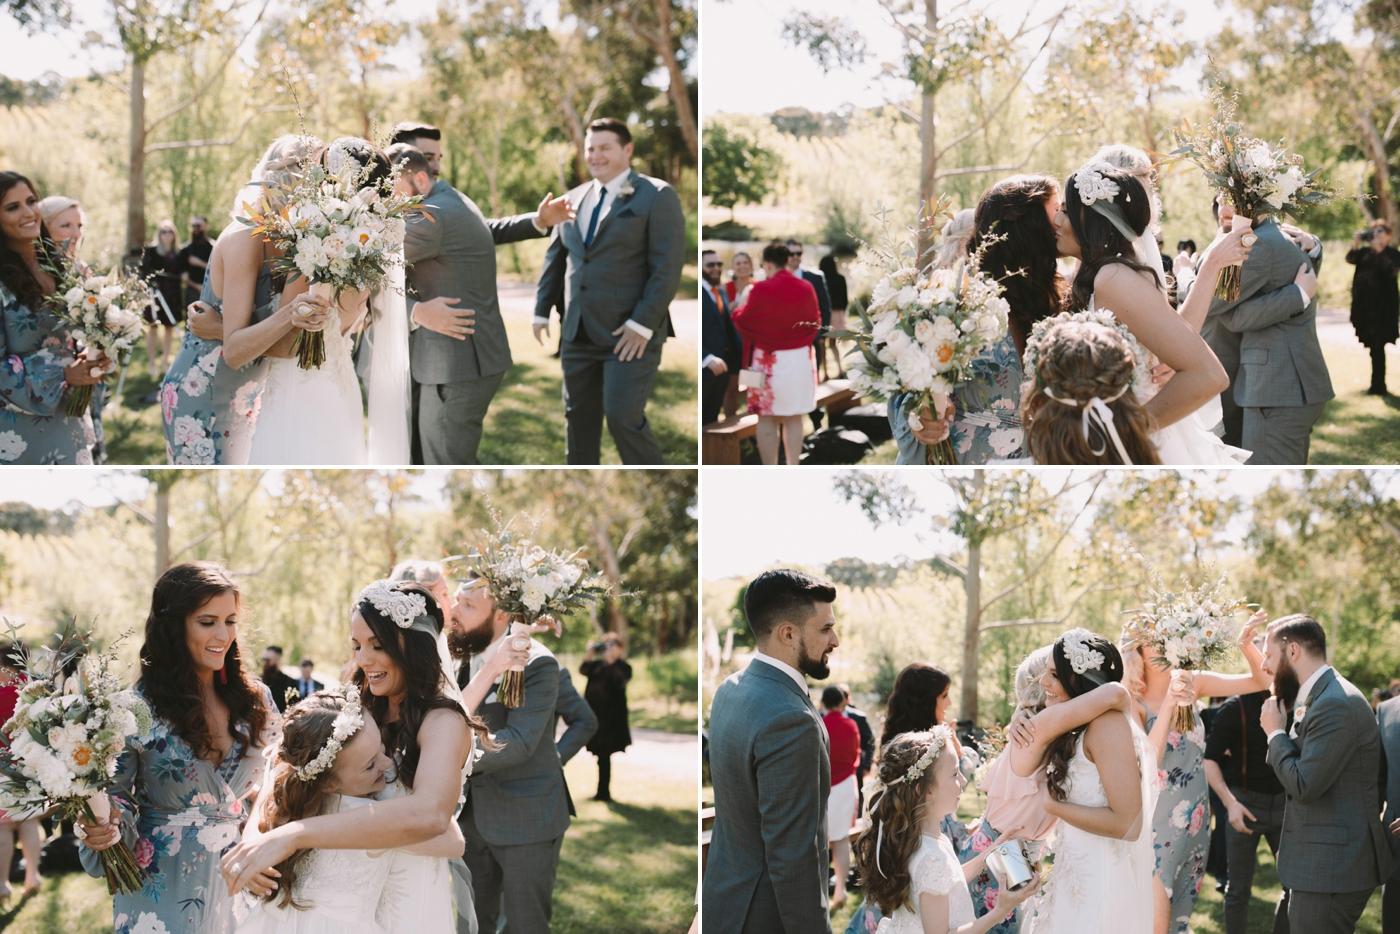 Maddy & Wes - K1 by Geoff Hardy Wedding - Adelaide Wedding Photographer - Natural wedding photography in Adelaide - Katherine Schultz_0035.jpg